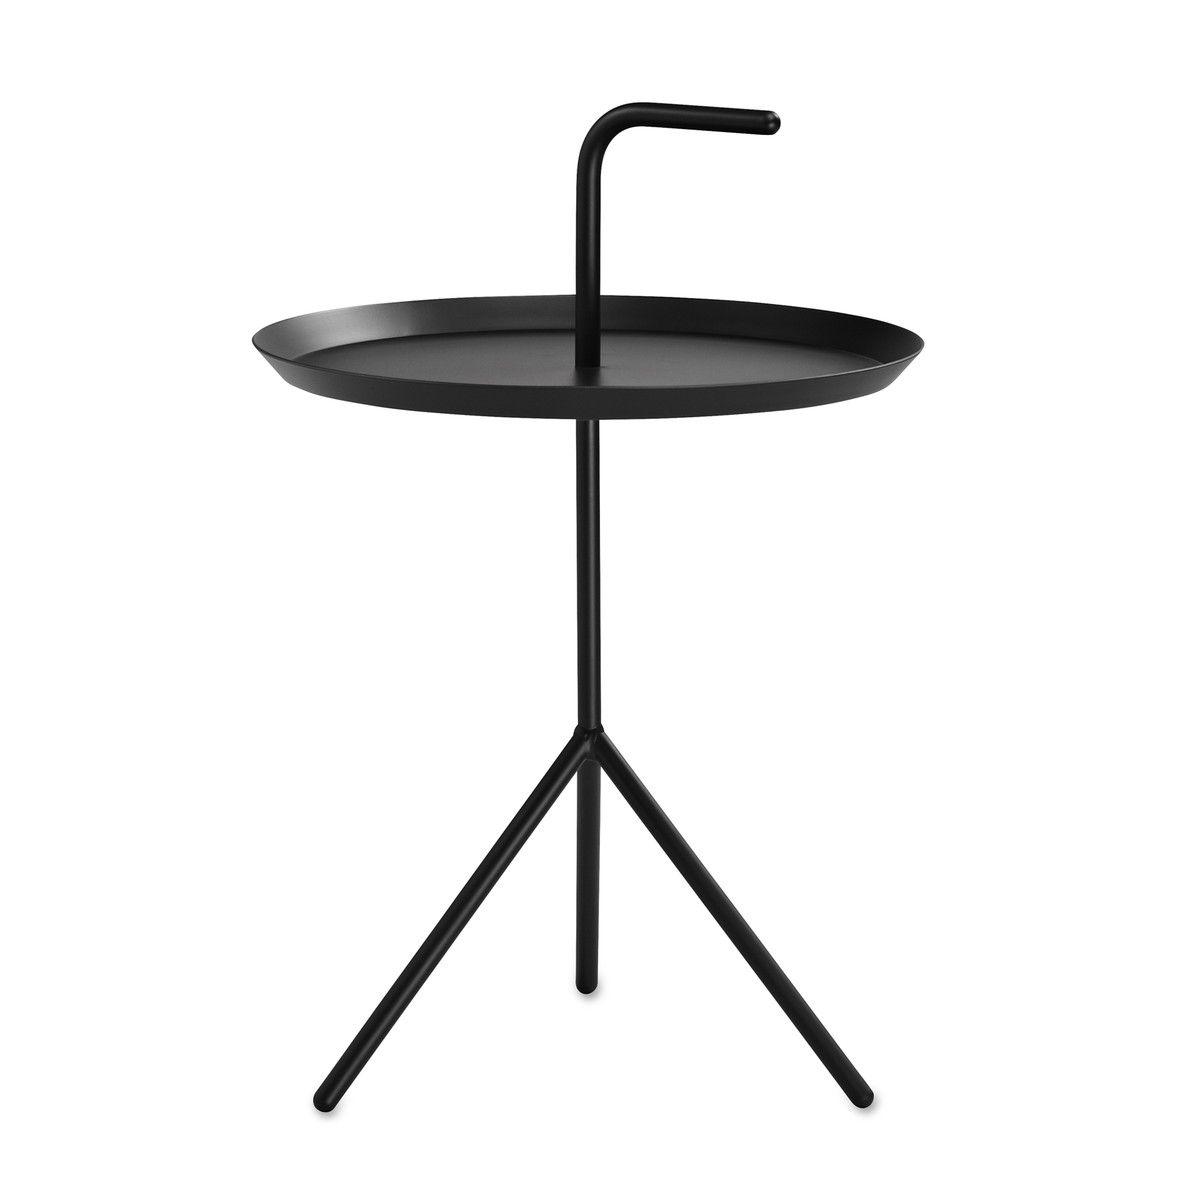 Hay Dlm Beistelltisch Powder Table Basse Table De Chevet Table Basse Design Pas Cher